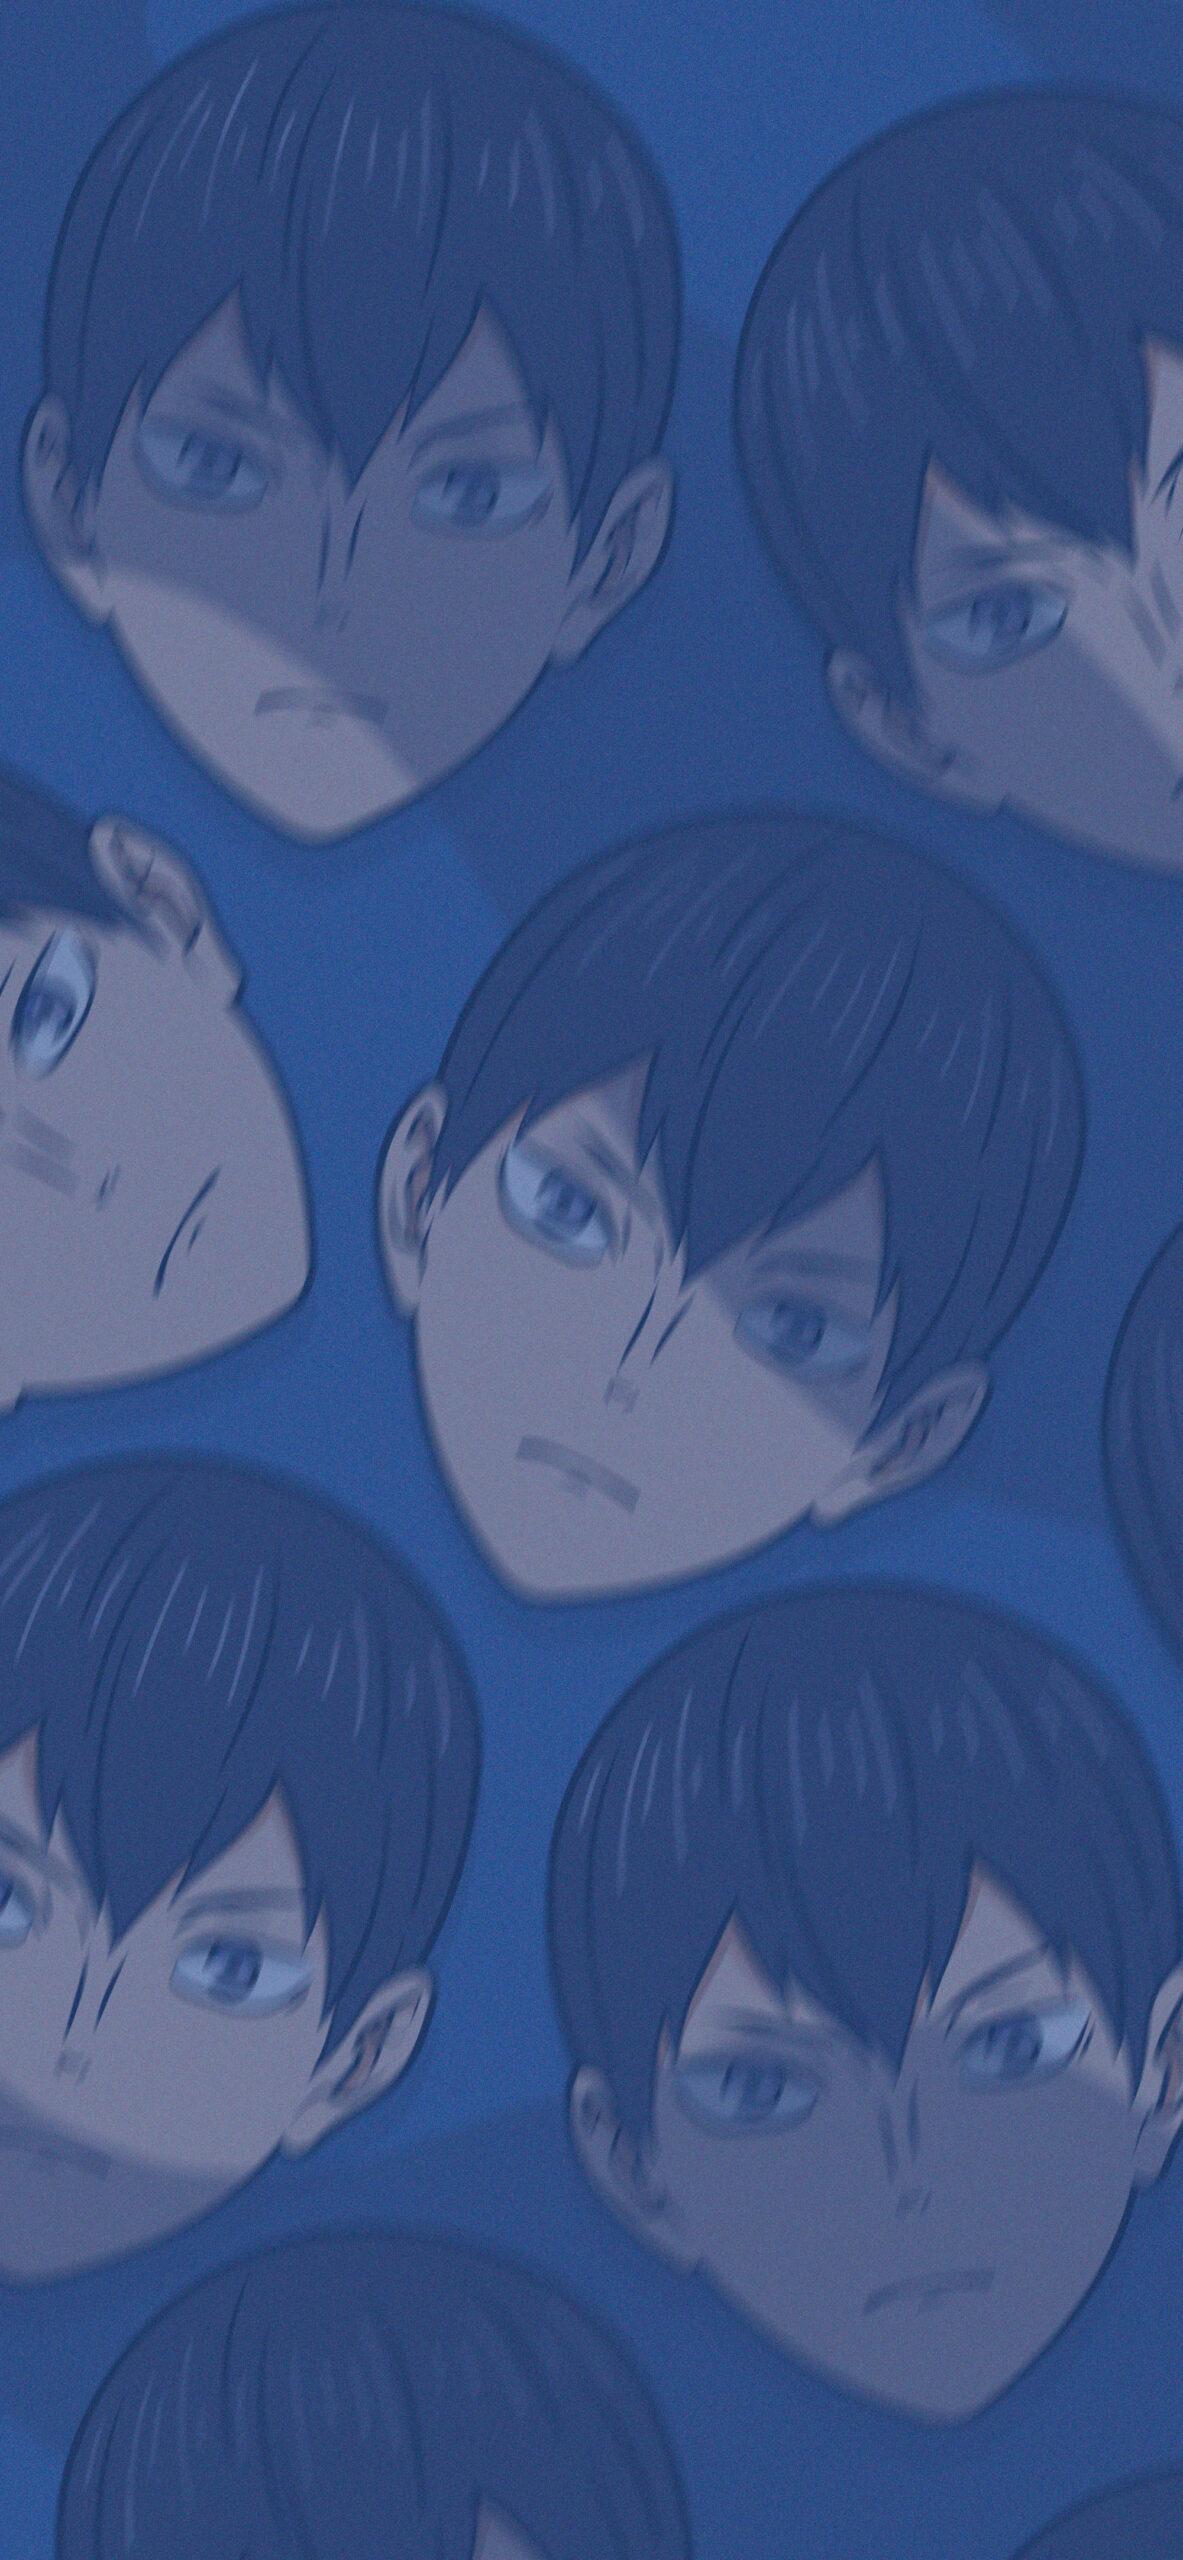 haikyuu tobio kageyama blue background